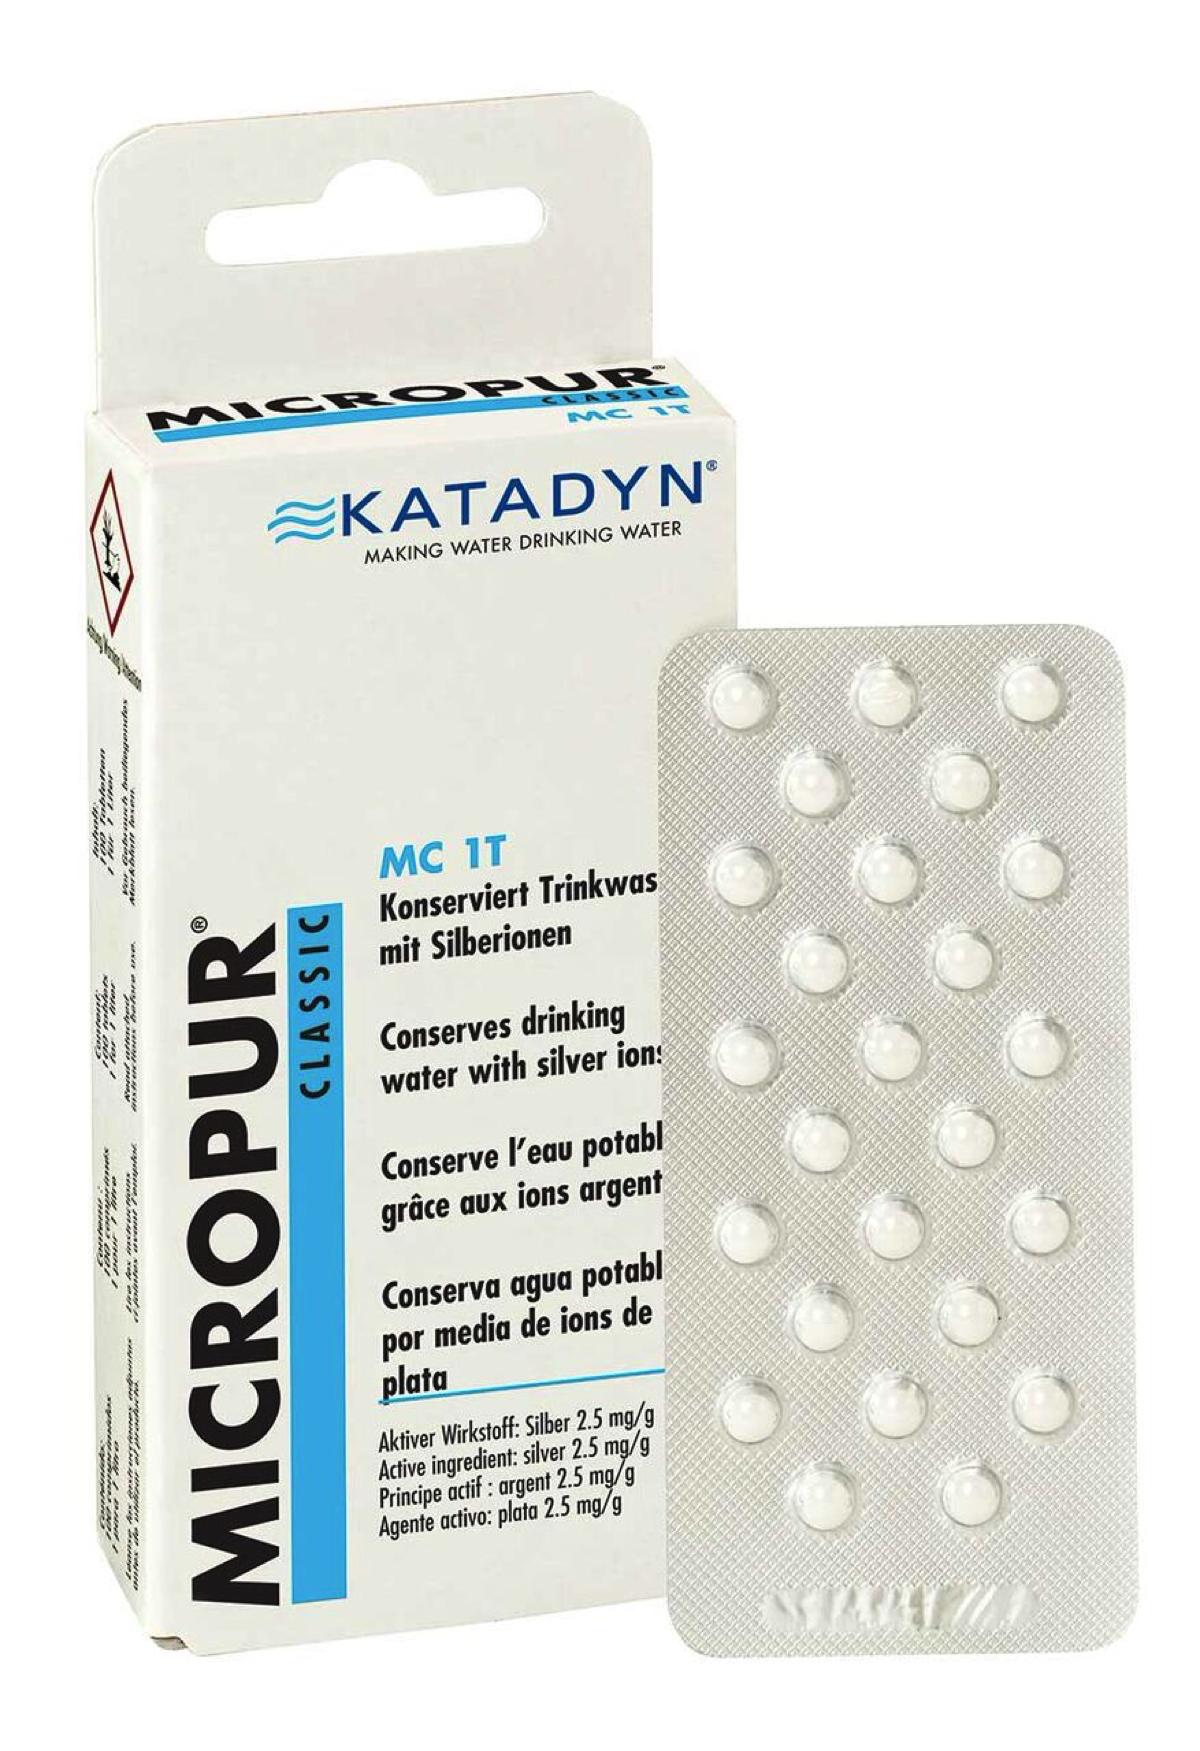 Katadyn - Micropur Classic MC 1T - Water purification